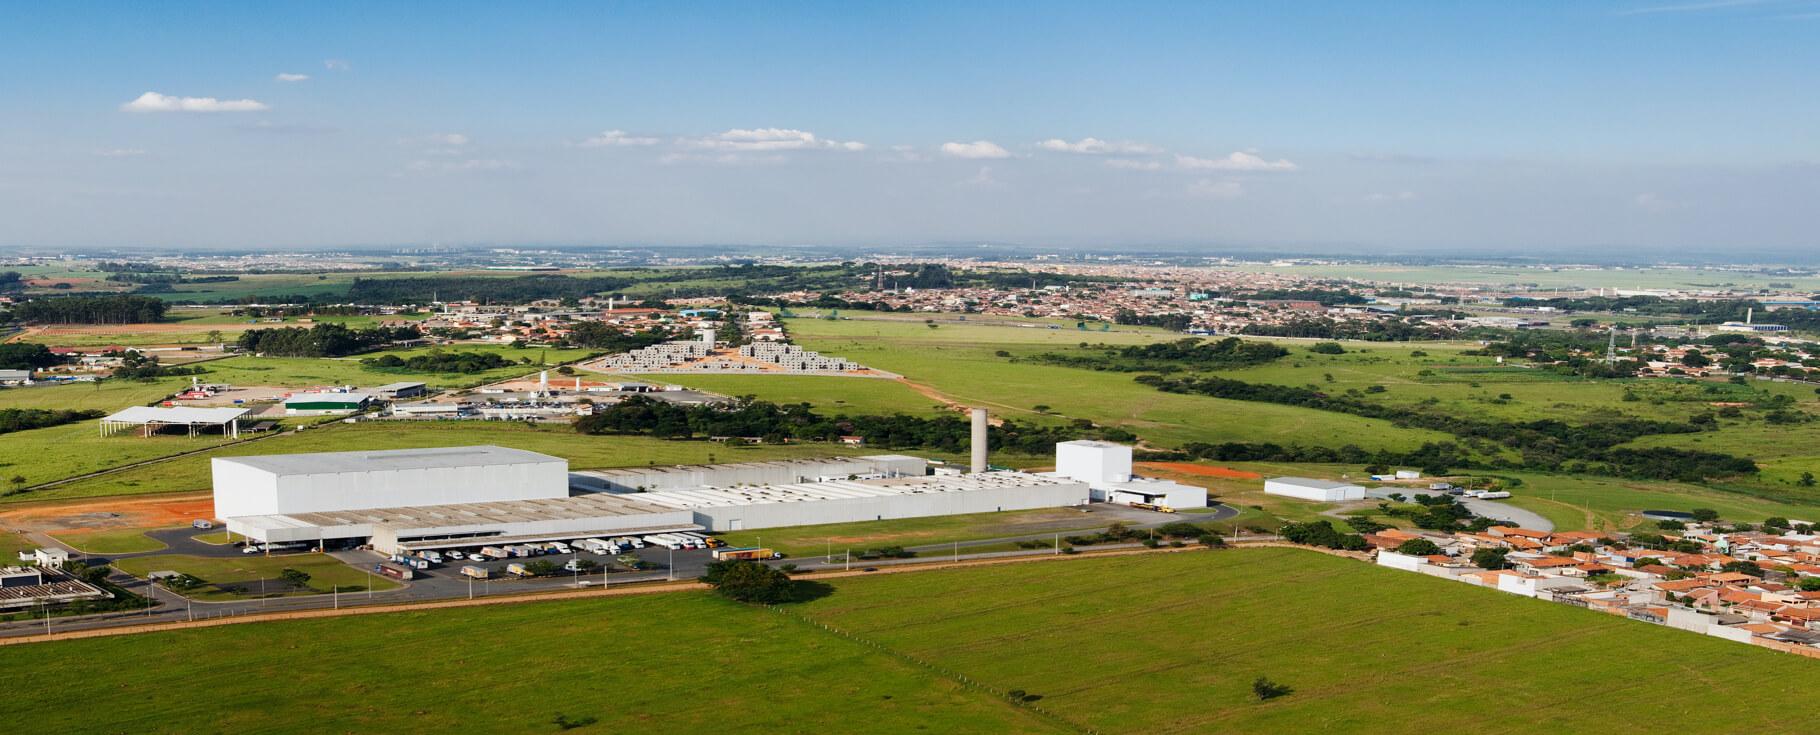 Fotografia aérea da fábrica da Selmi em Rolândia